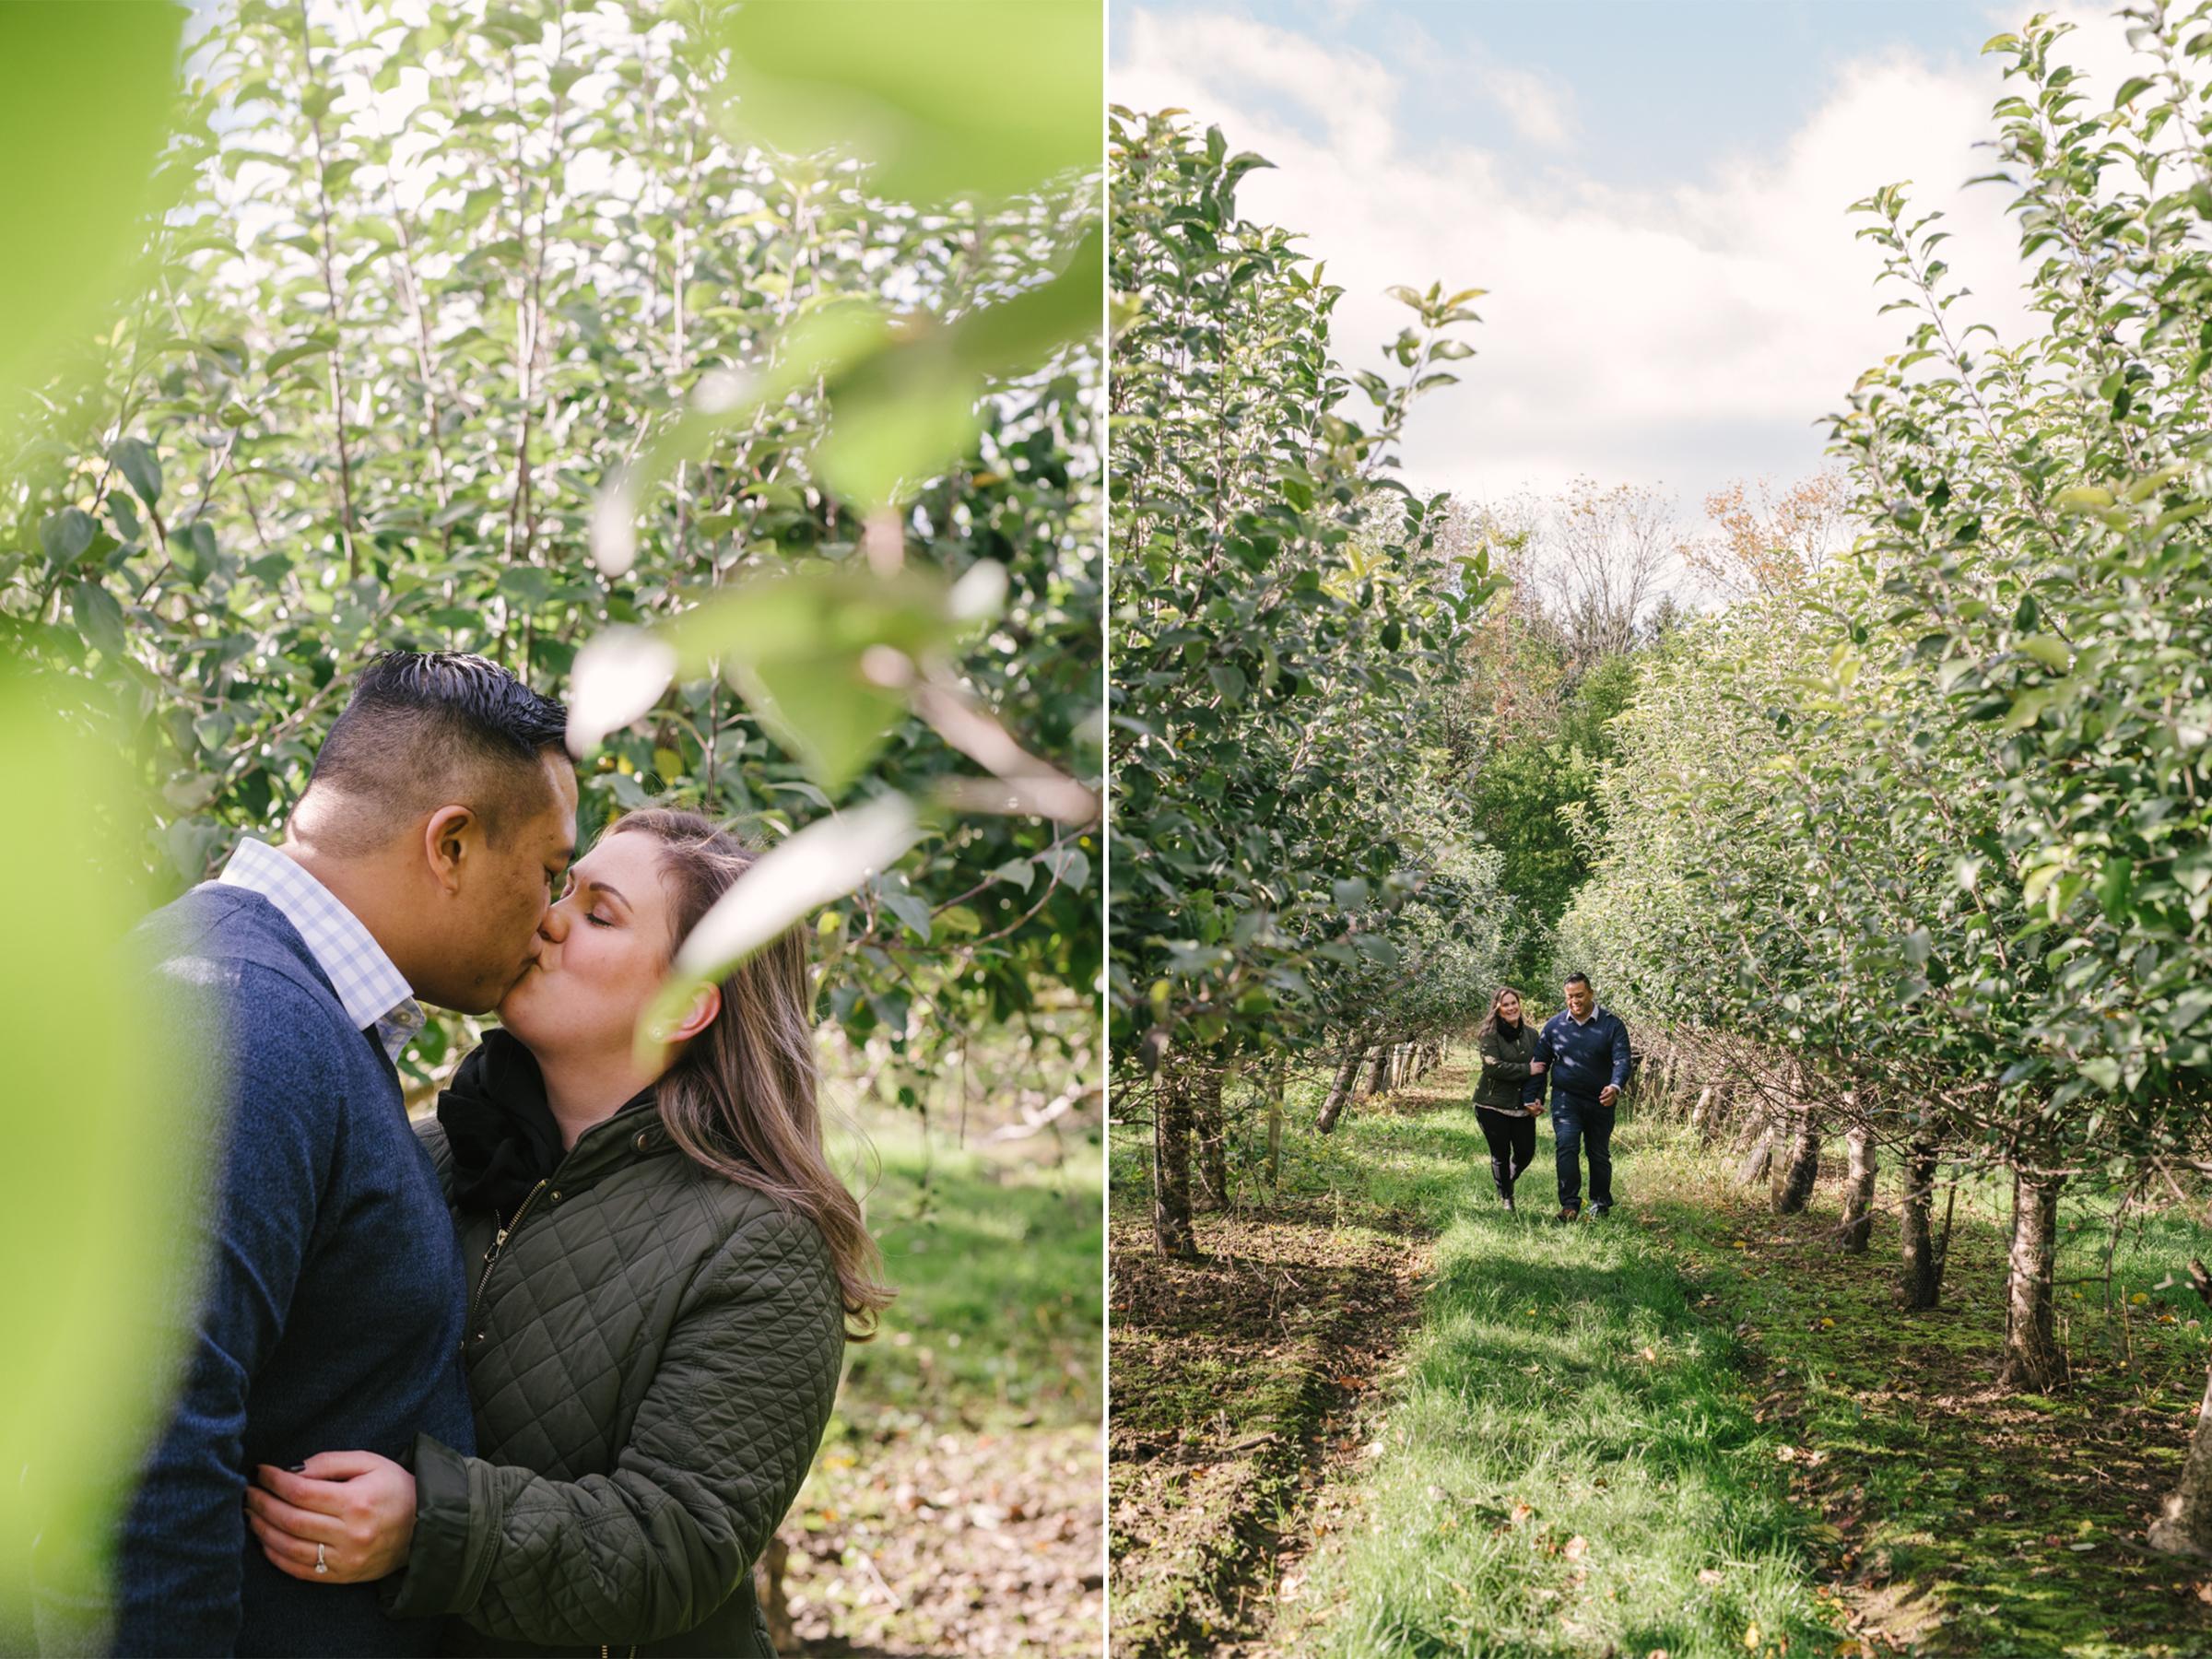 Warwick Winery Engagement Session- Diana+Jon- Fall Engagement Photos- New York- Olivia Christina Photo-Web2.jpg